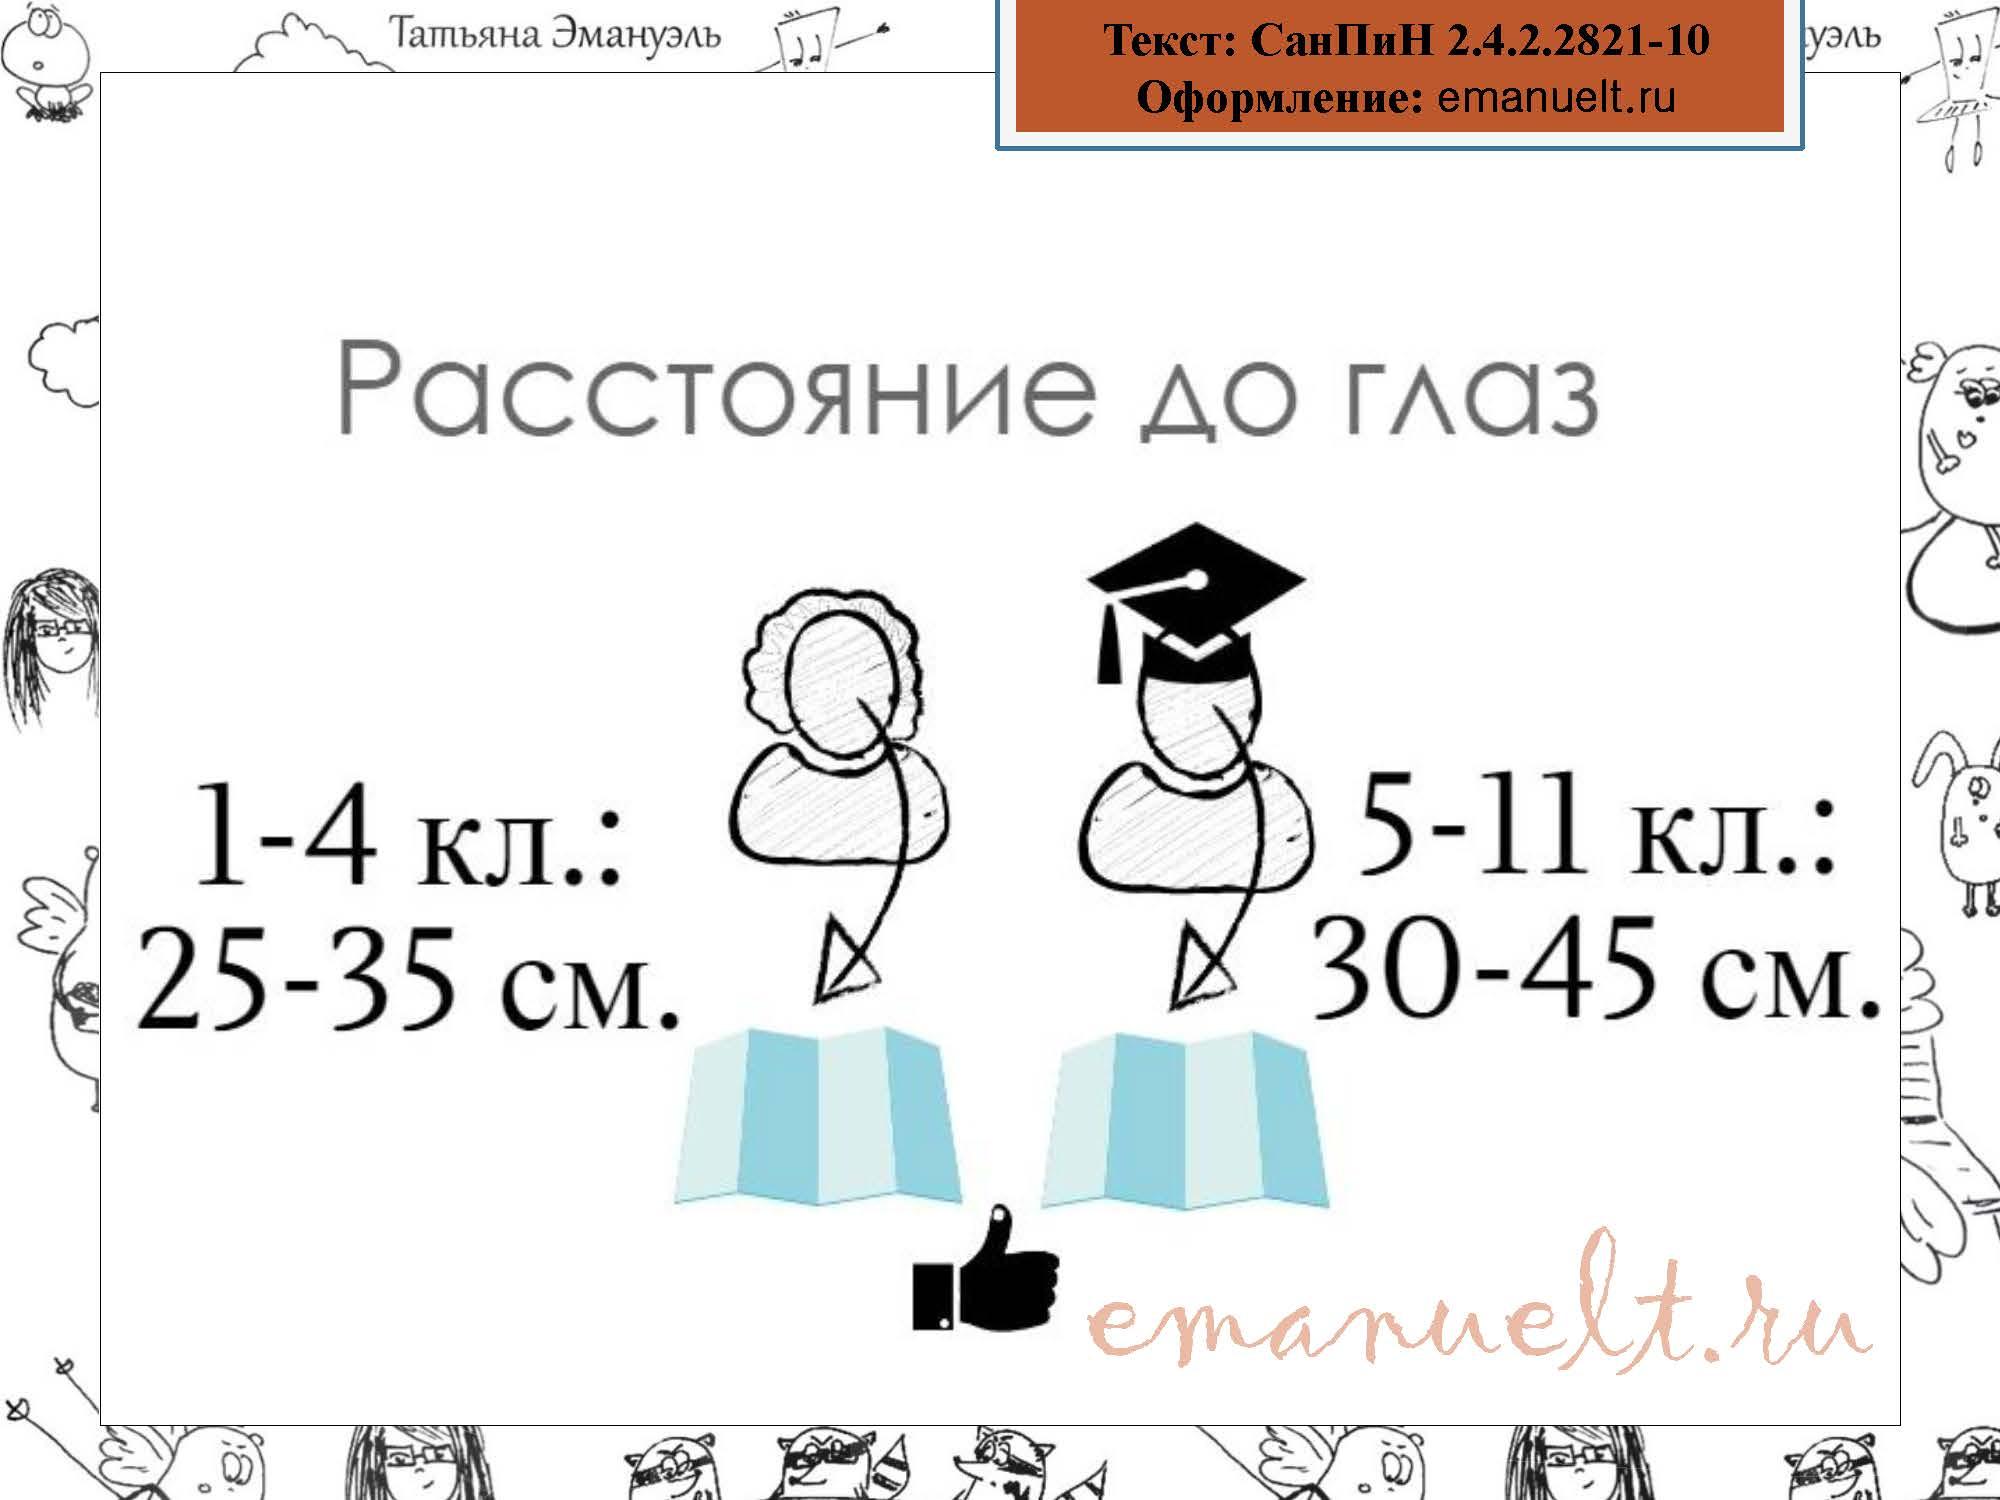 санпин доп_Страница_08